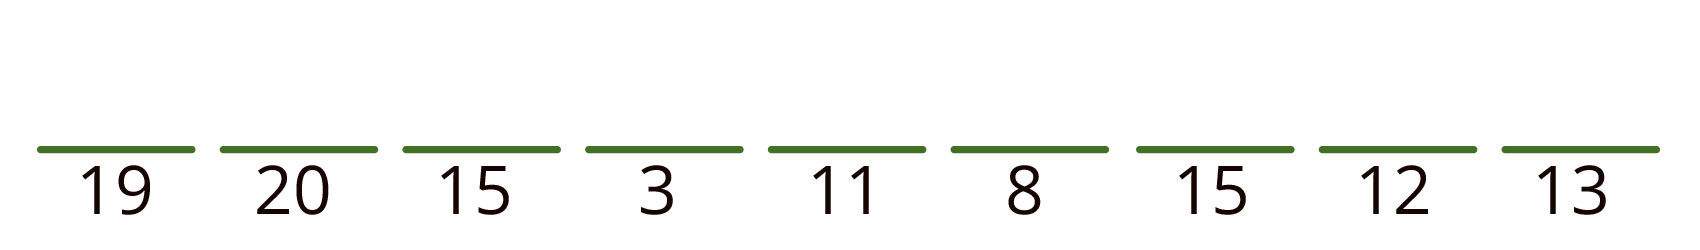 19 20 15 3 11 8 15 12 13